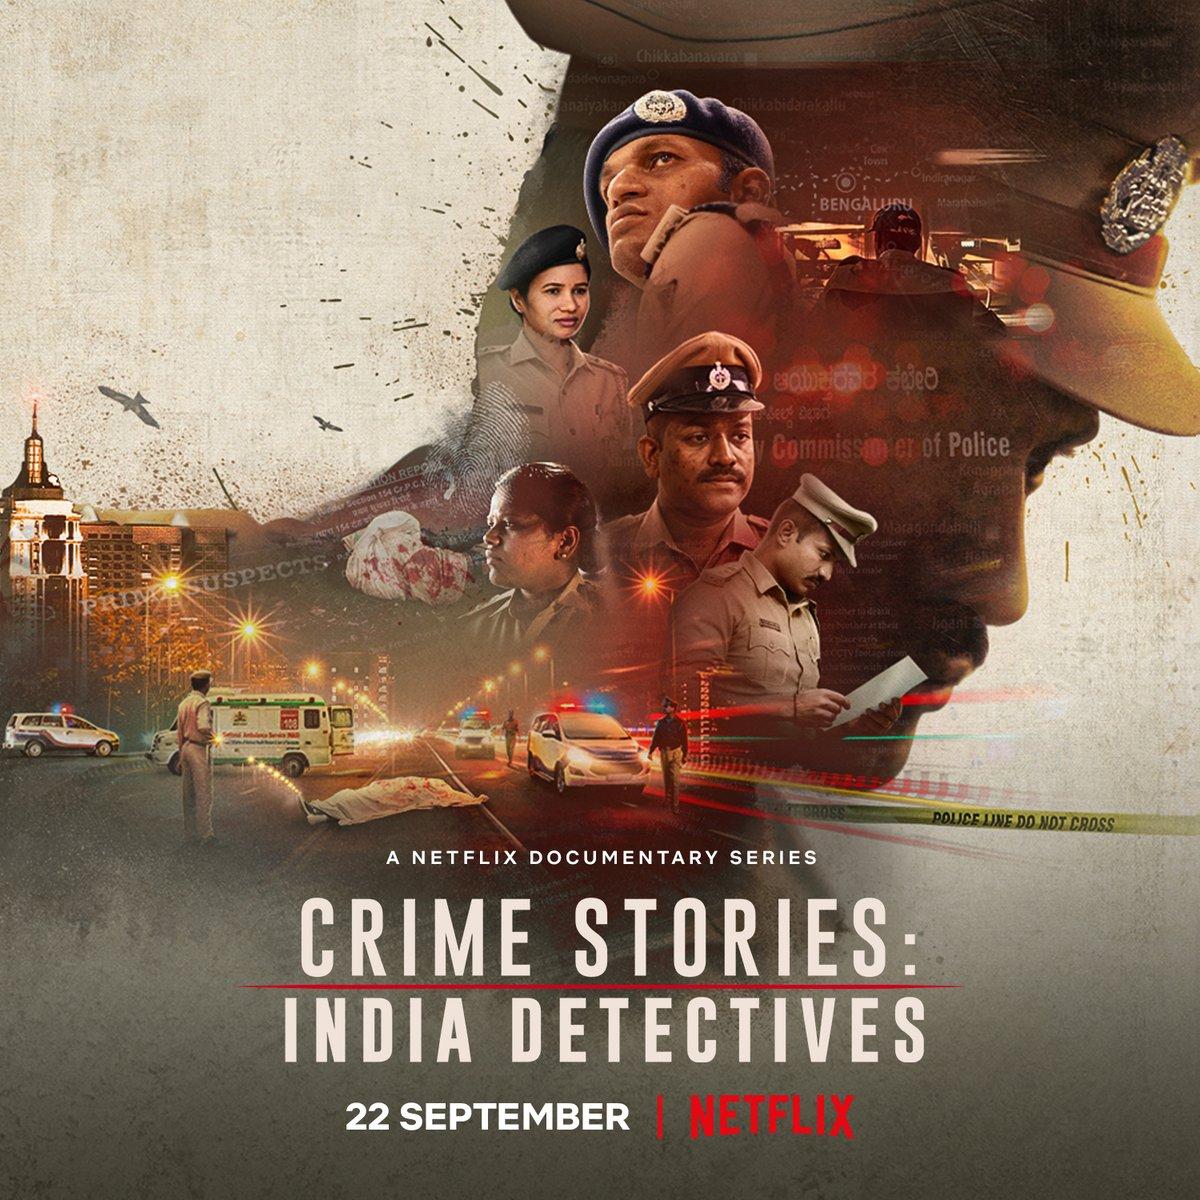 Crime Stories India Detectives 2021 S01 Hindi Complete NF Original Web Series 720p HDRip 1.23GB Download